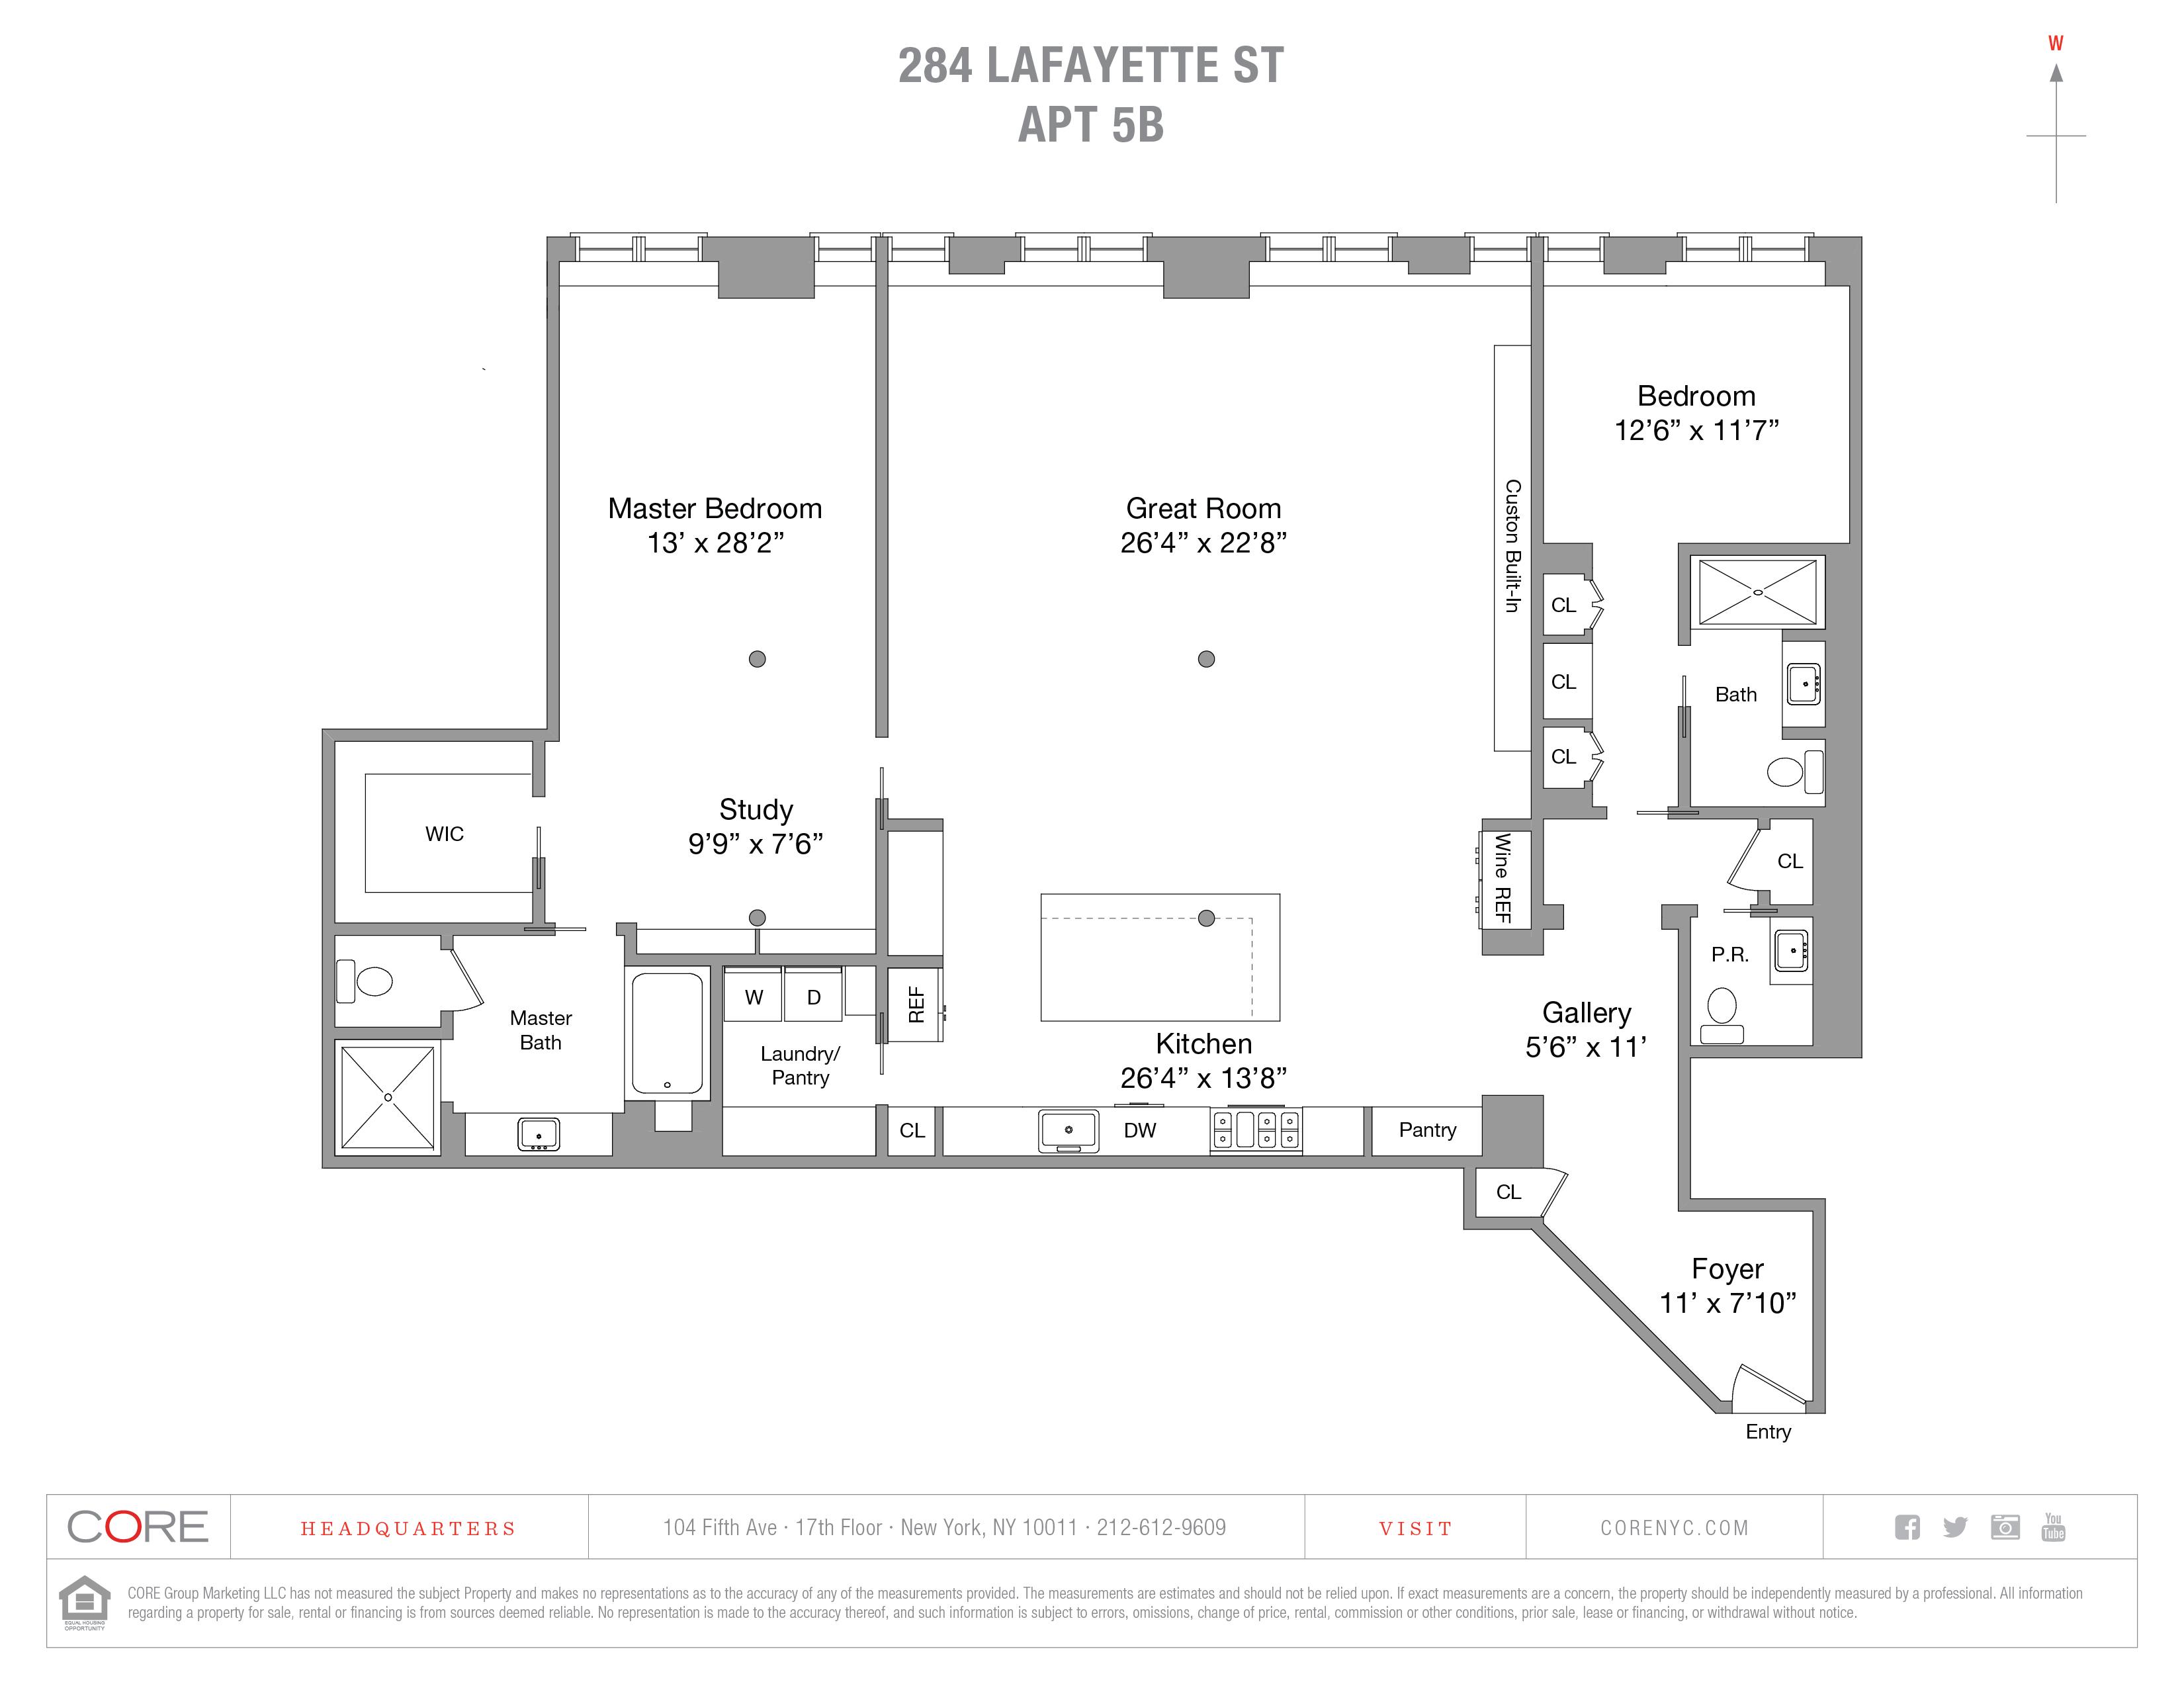 284 Lafayette St. 5BB, New York, NY 10012